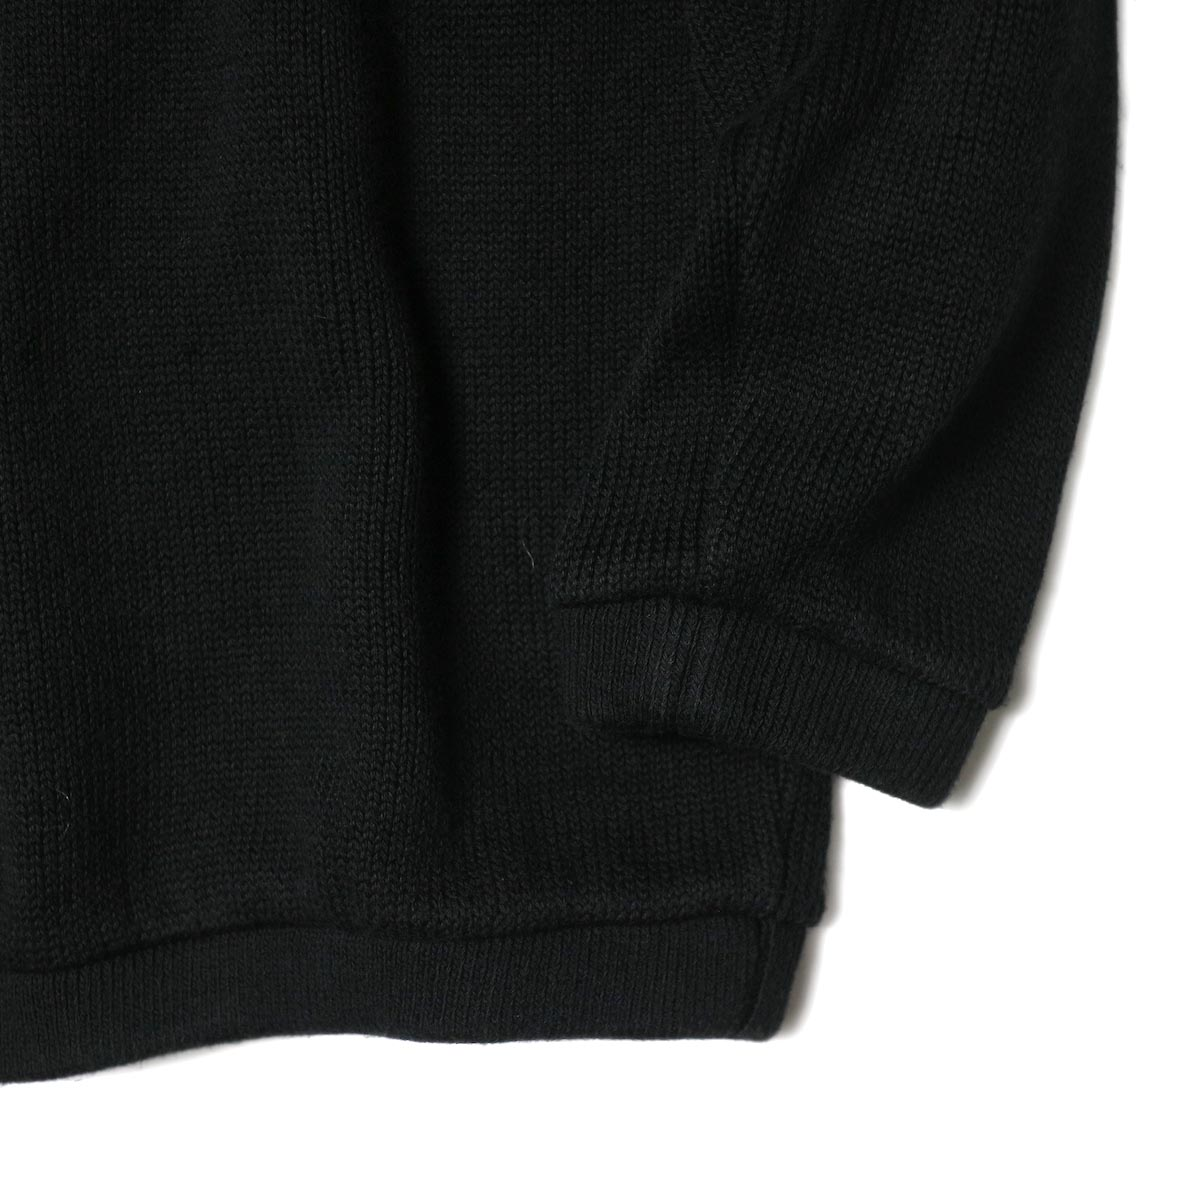 alvana / RIB KNIT CREWNECK P/O (Black) 袖・裾